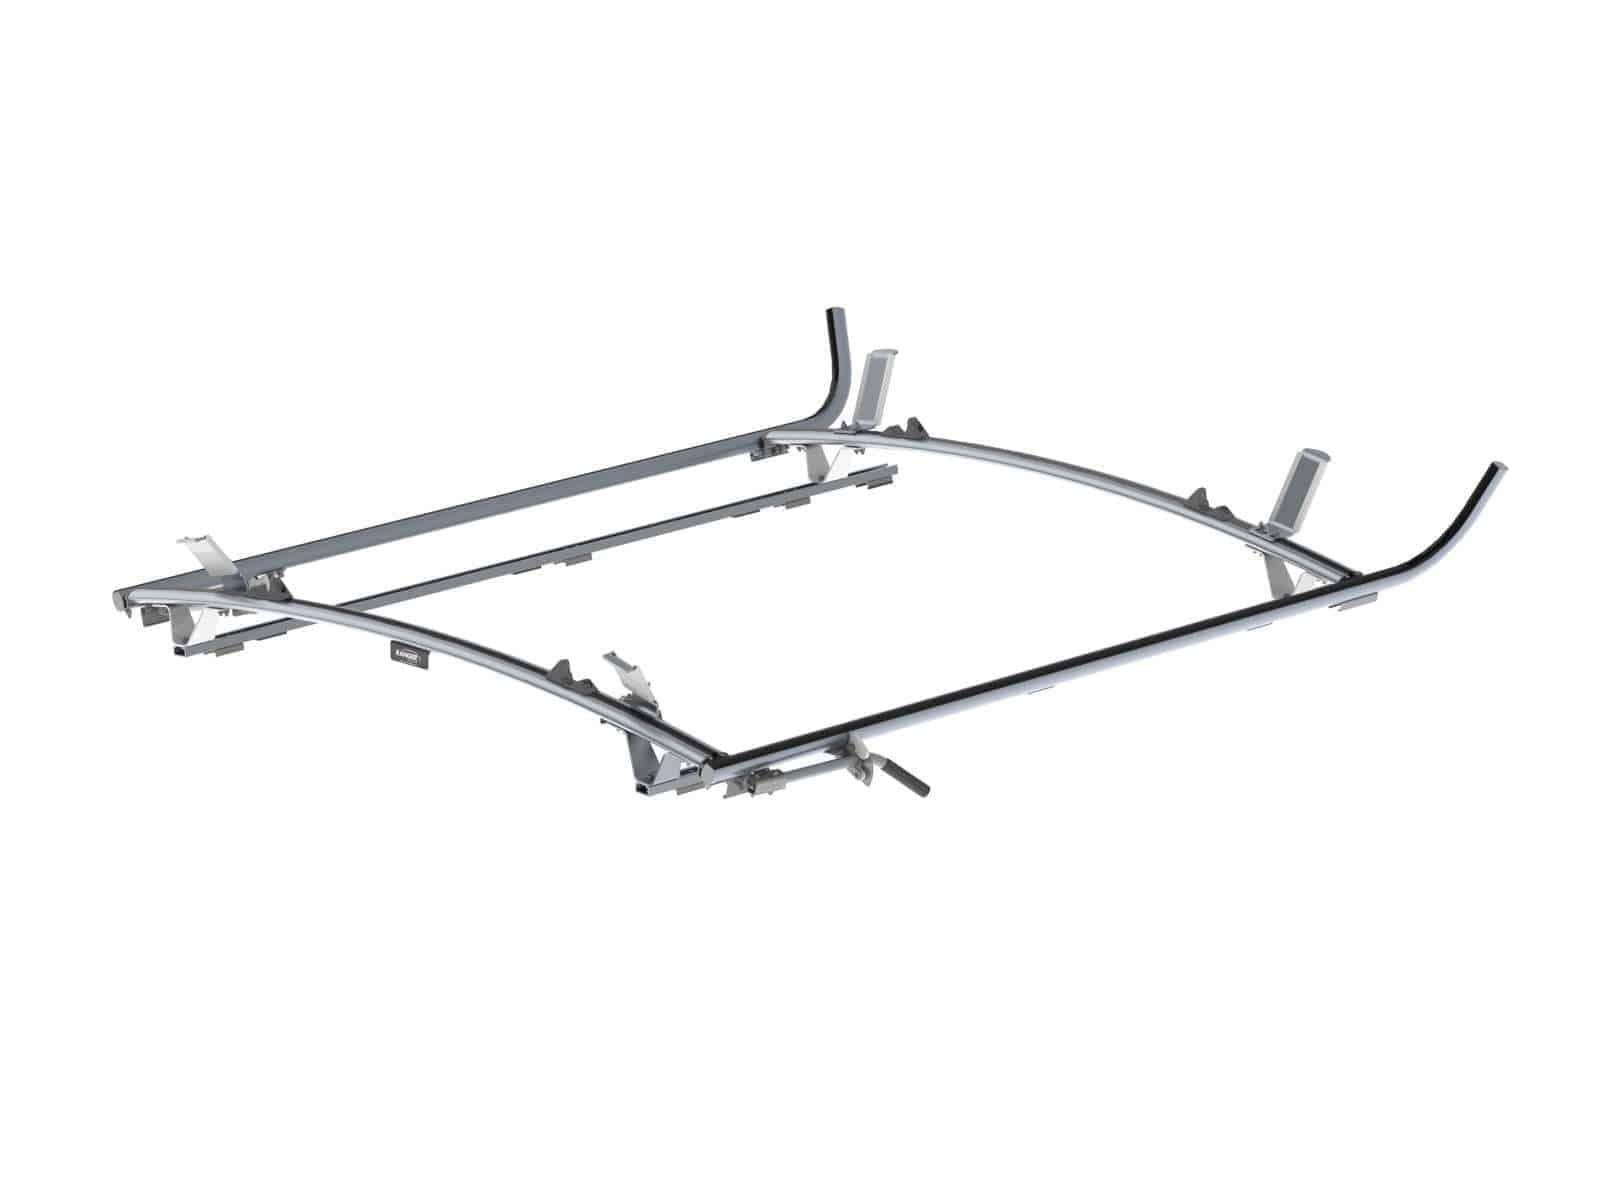 Ranger Design 1530-PHL Aluminum 2-Bar Double Clamp Ladder